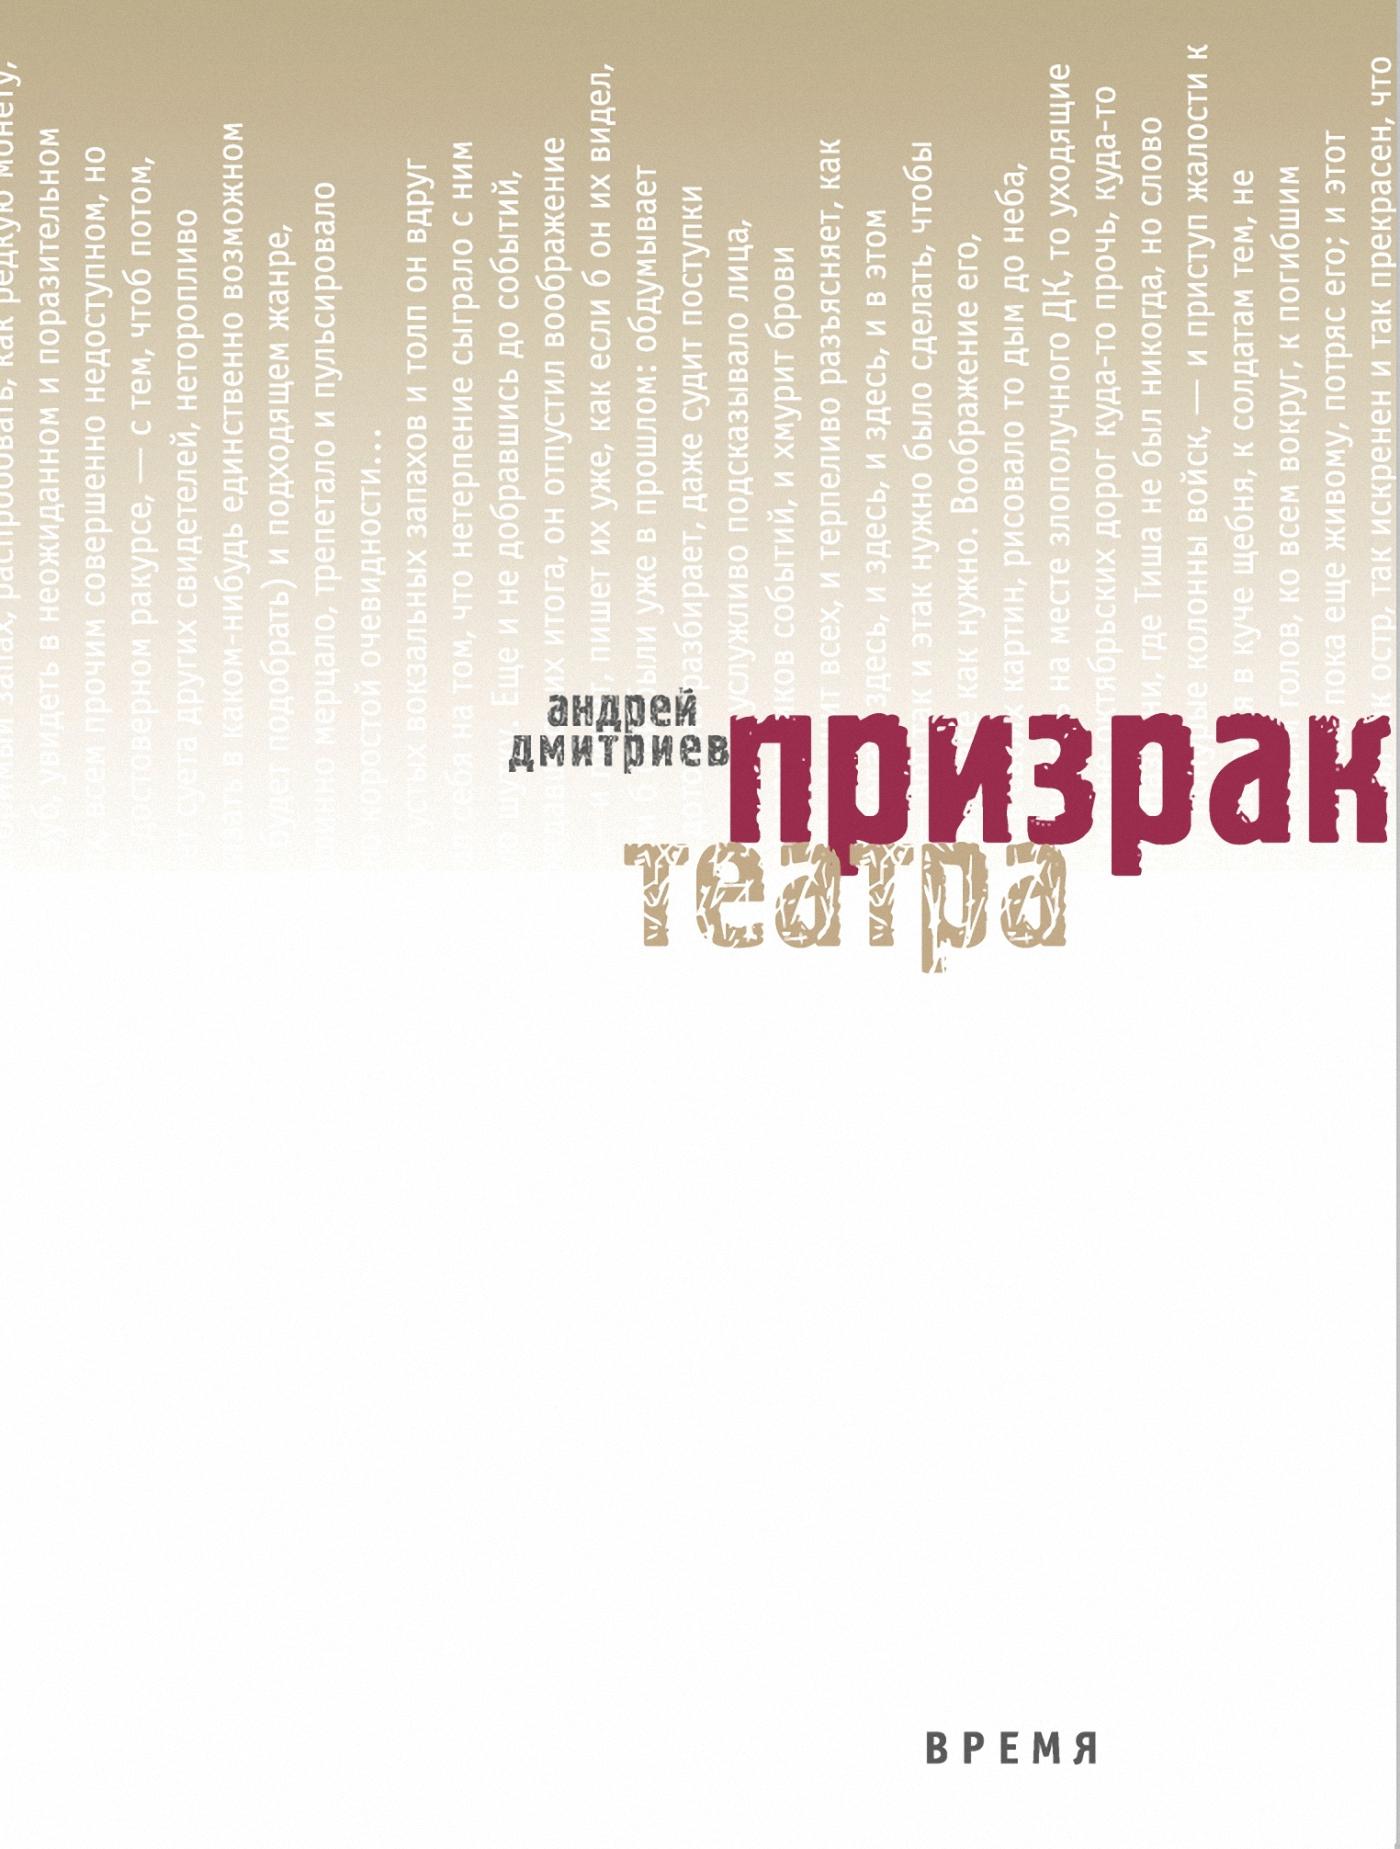 Андрей Дмитриев Призрак театра цена